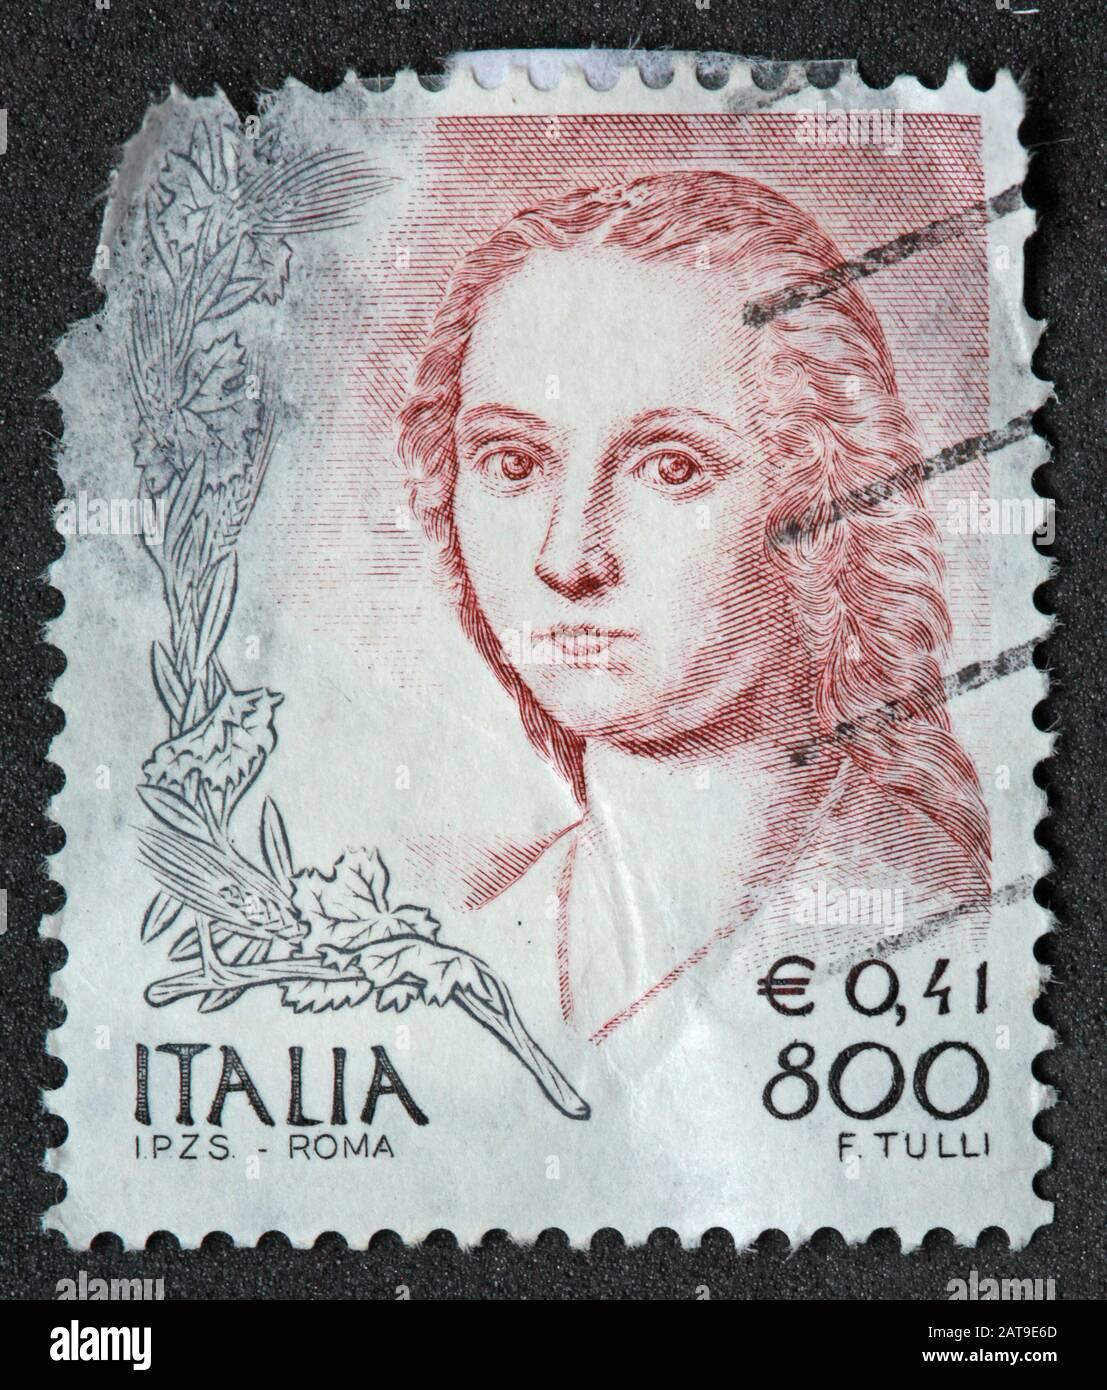 Hotpixuk,@Hotpixuk,GoTonySmith,stamp,postal,franked,frank,used stamps,used franked,used,franked stamp,from envelope,history,historic,old,Italy,Italian,Italia,Italy Stamp,italian stamp,franked Italian stamp,used Italian stamp,Italy stamp,E0.41,800L,f tulli,stamp Italia,4c,800lire,woman,female